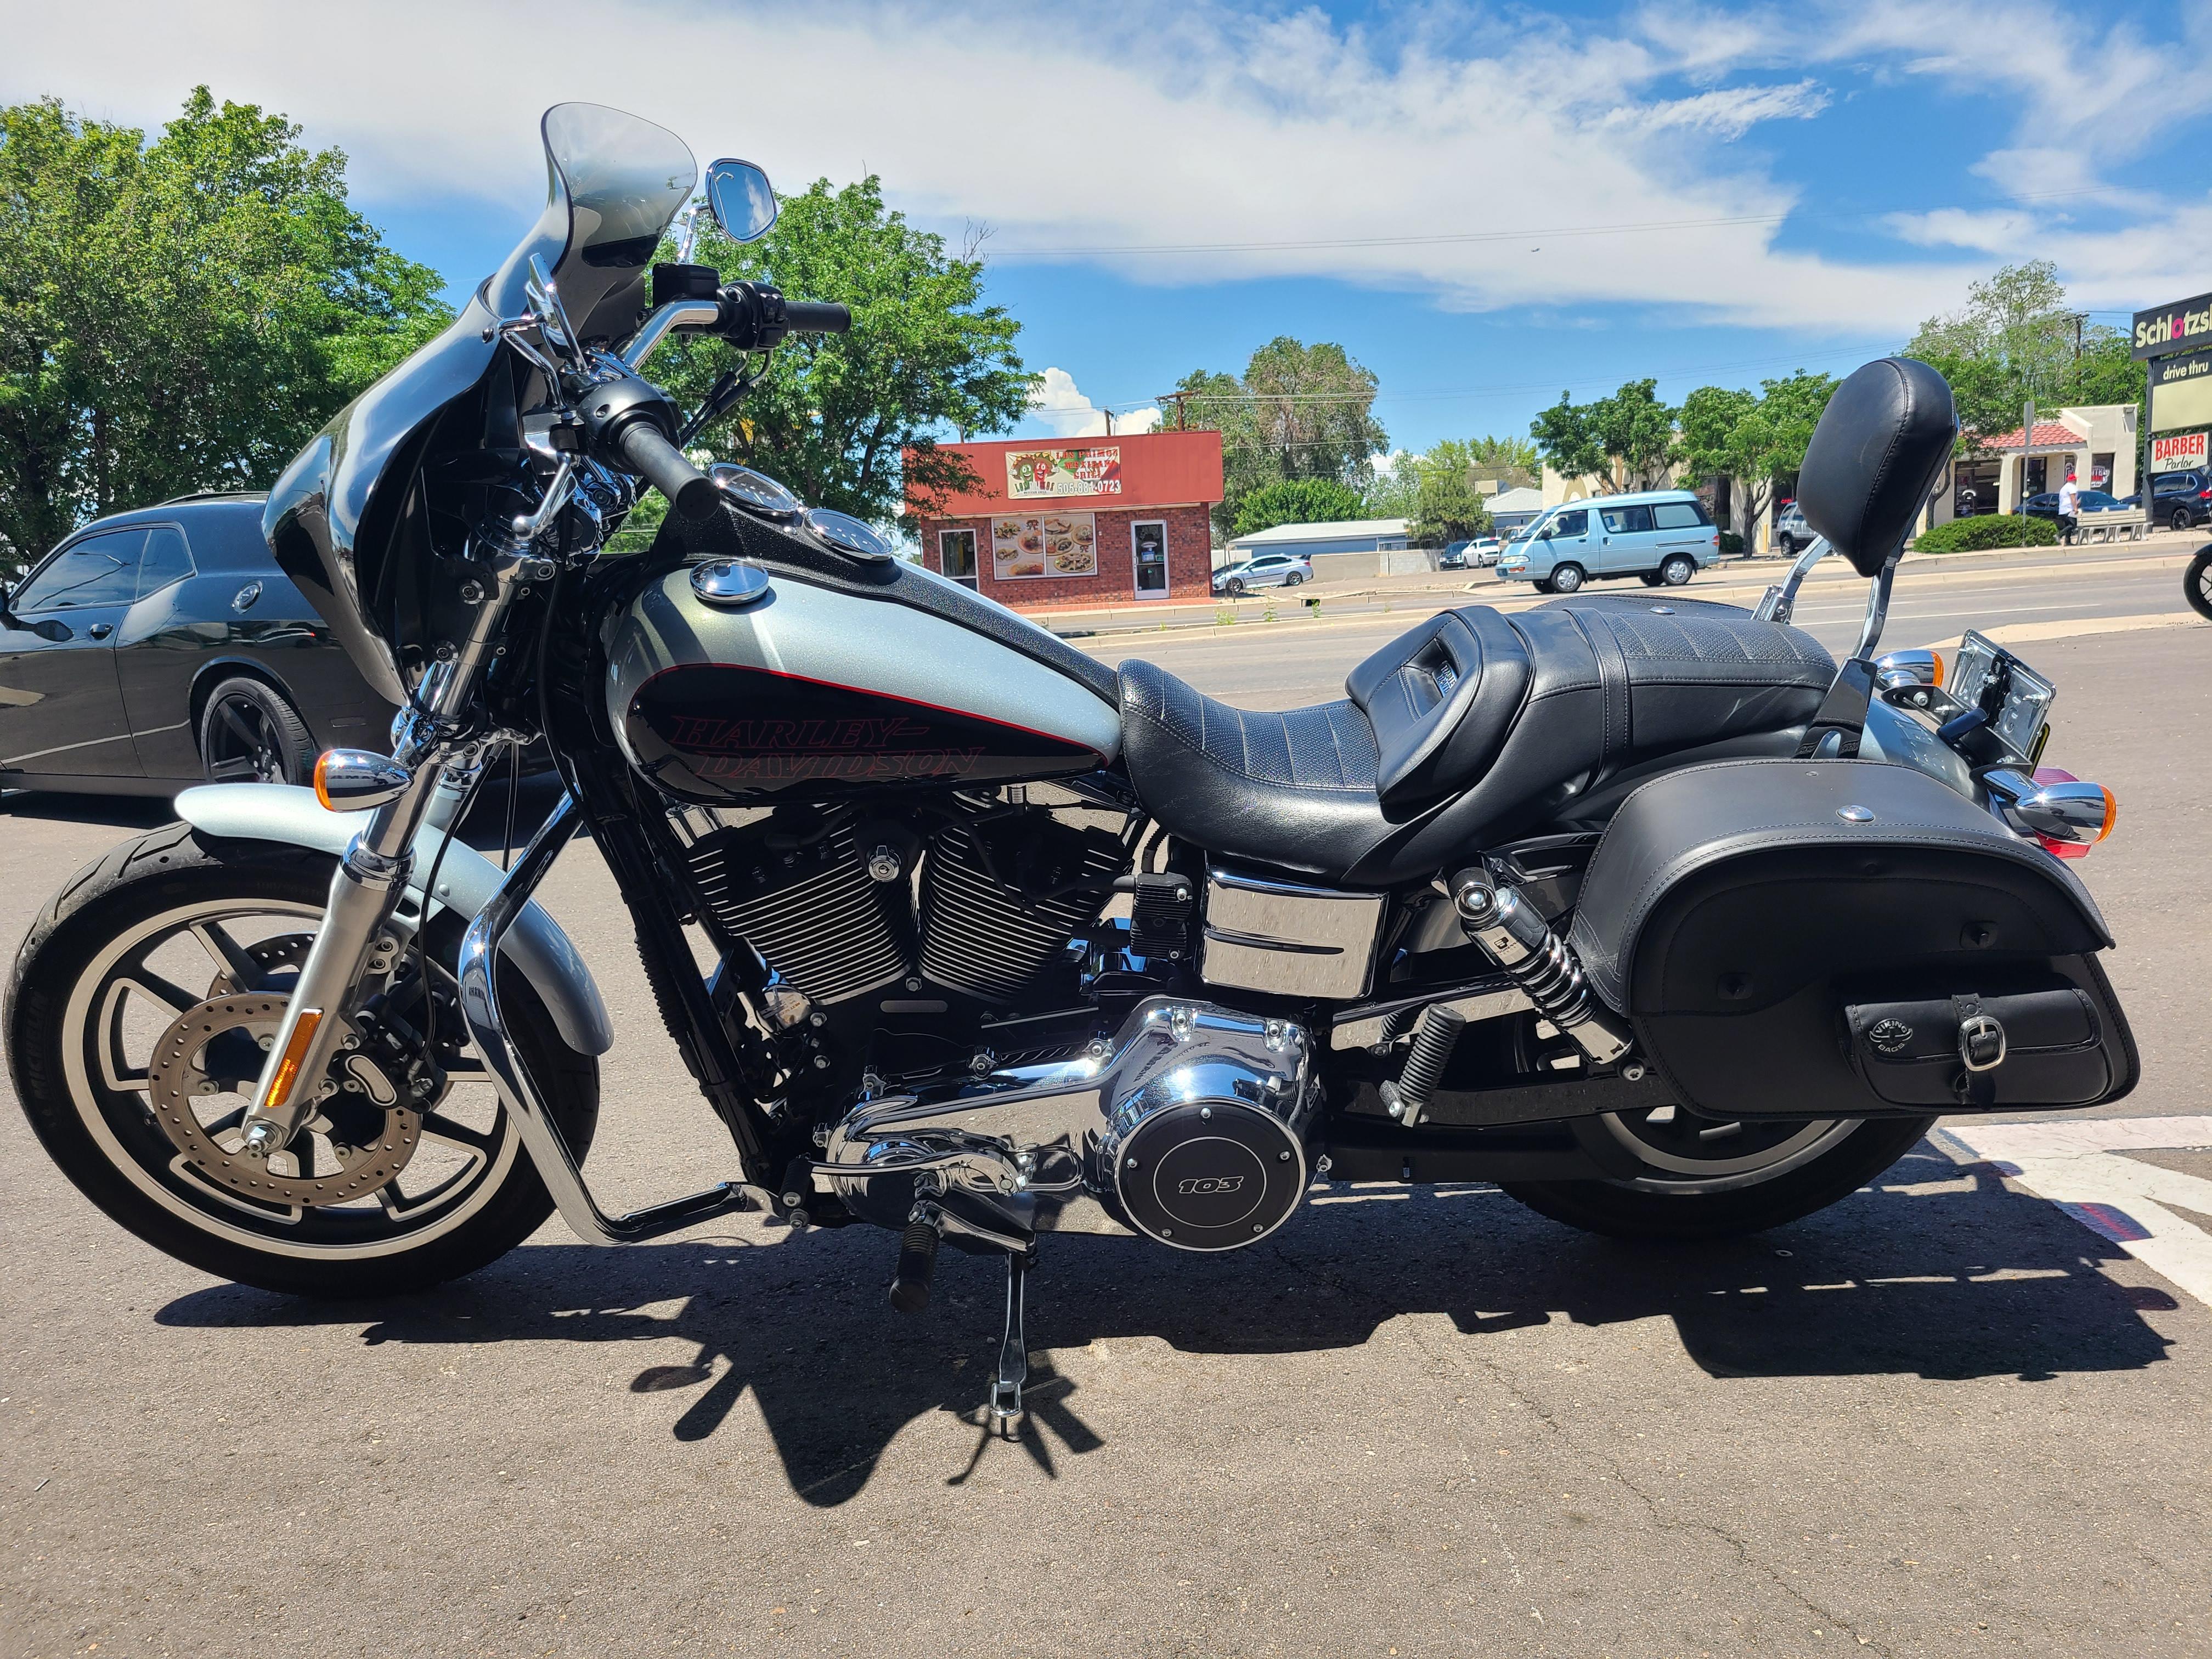 2014 Harley-Davidson Dyna Low Rider at Bobby J's Yamaha, Albuquerque, NM 87110